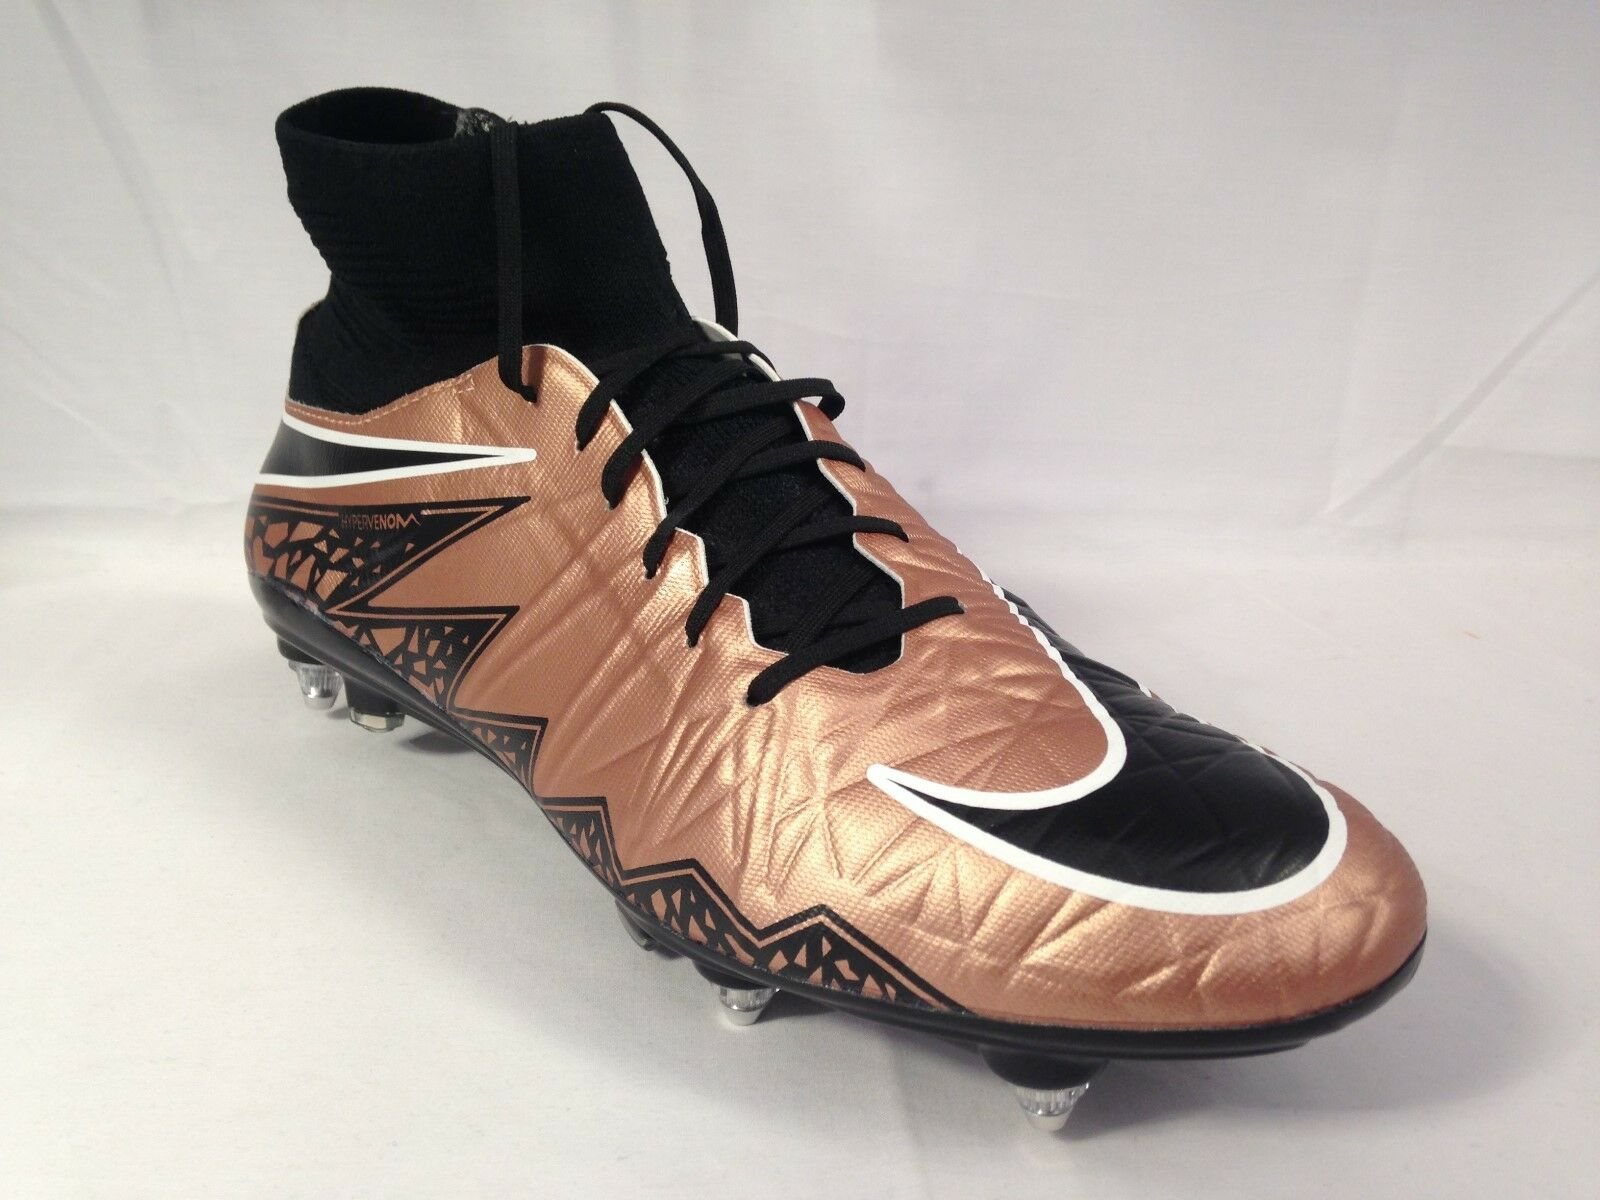 Para Hombre Nike Hypervenom Phatal II DF SG Pro 747491 903 Bronce Negro Tamaño  9